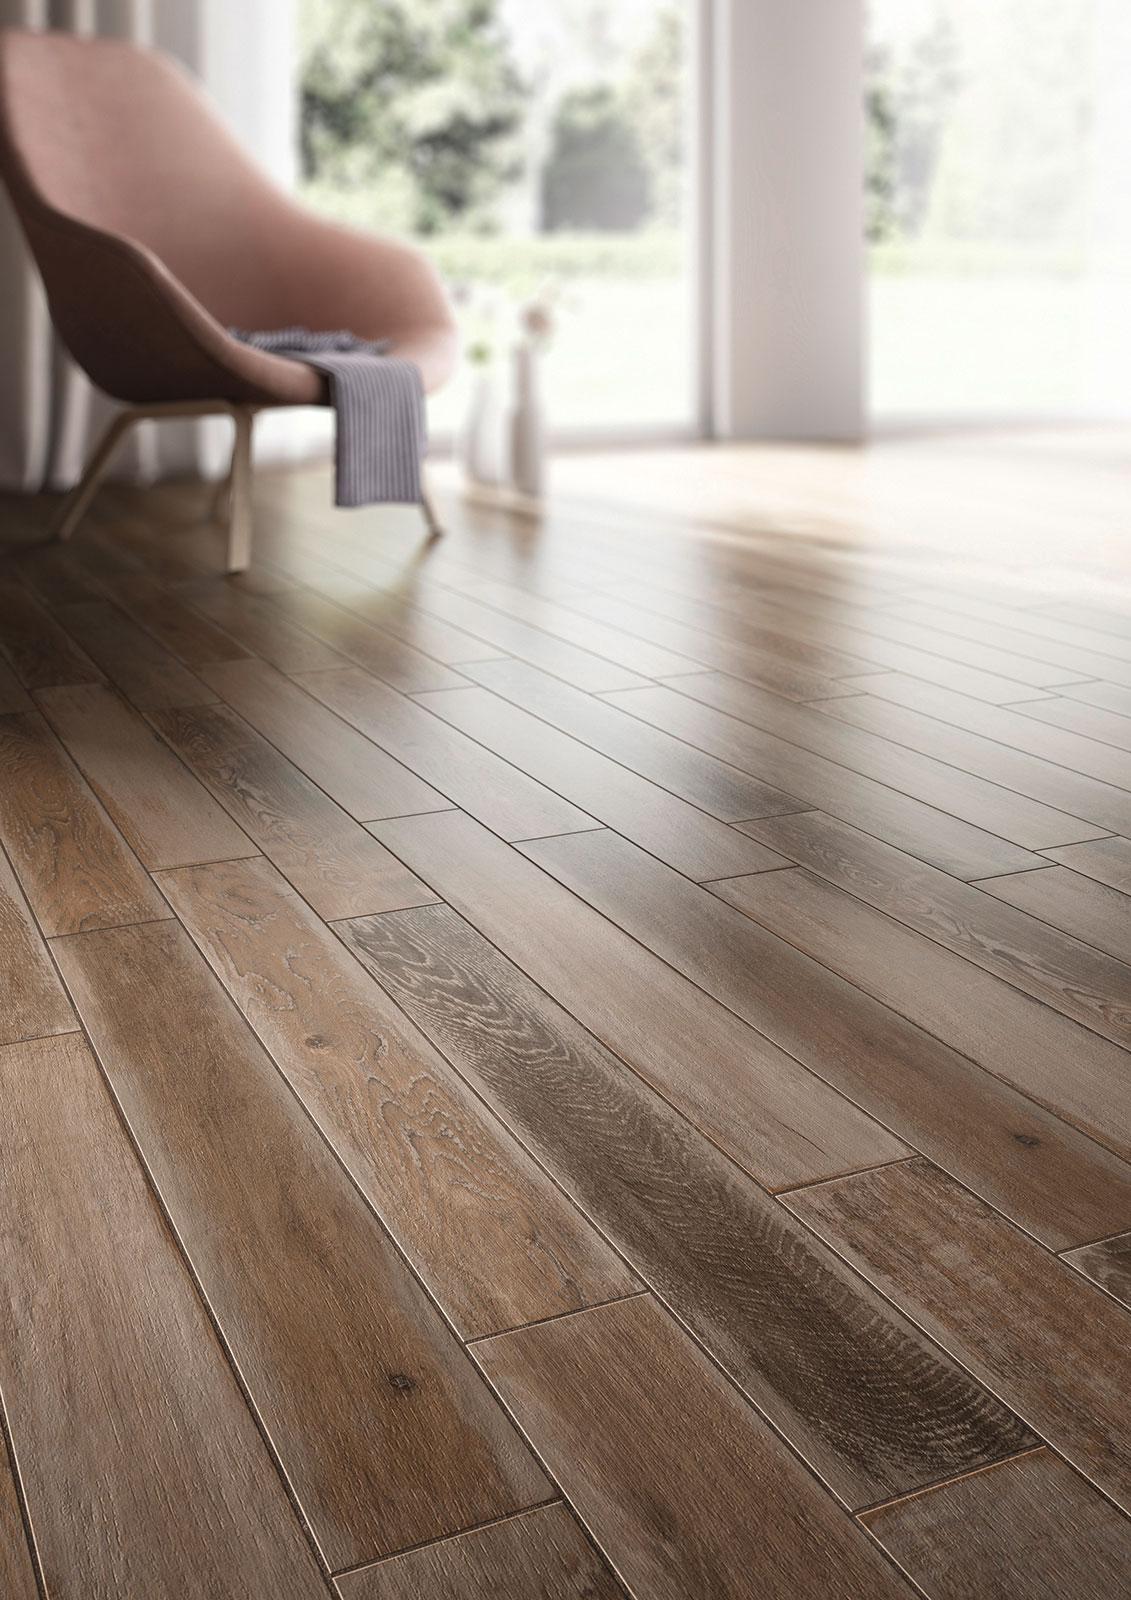 Treverkage wood effect stoneware flooring marazzi for Carrelage marazzi prix